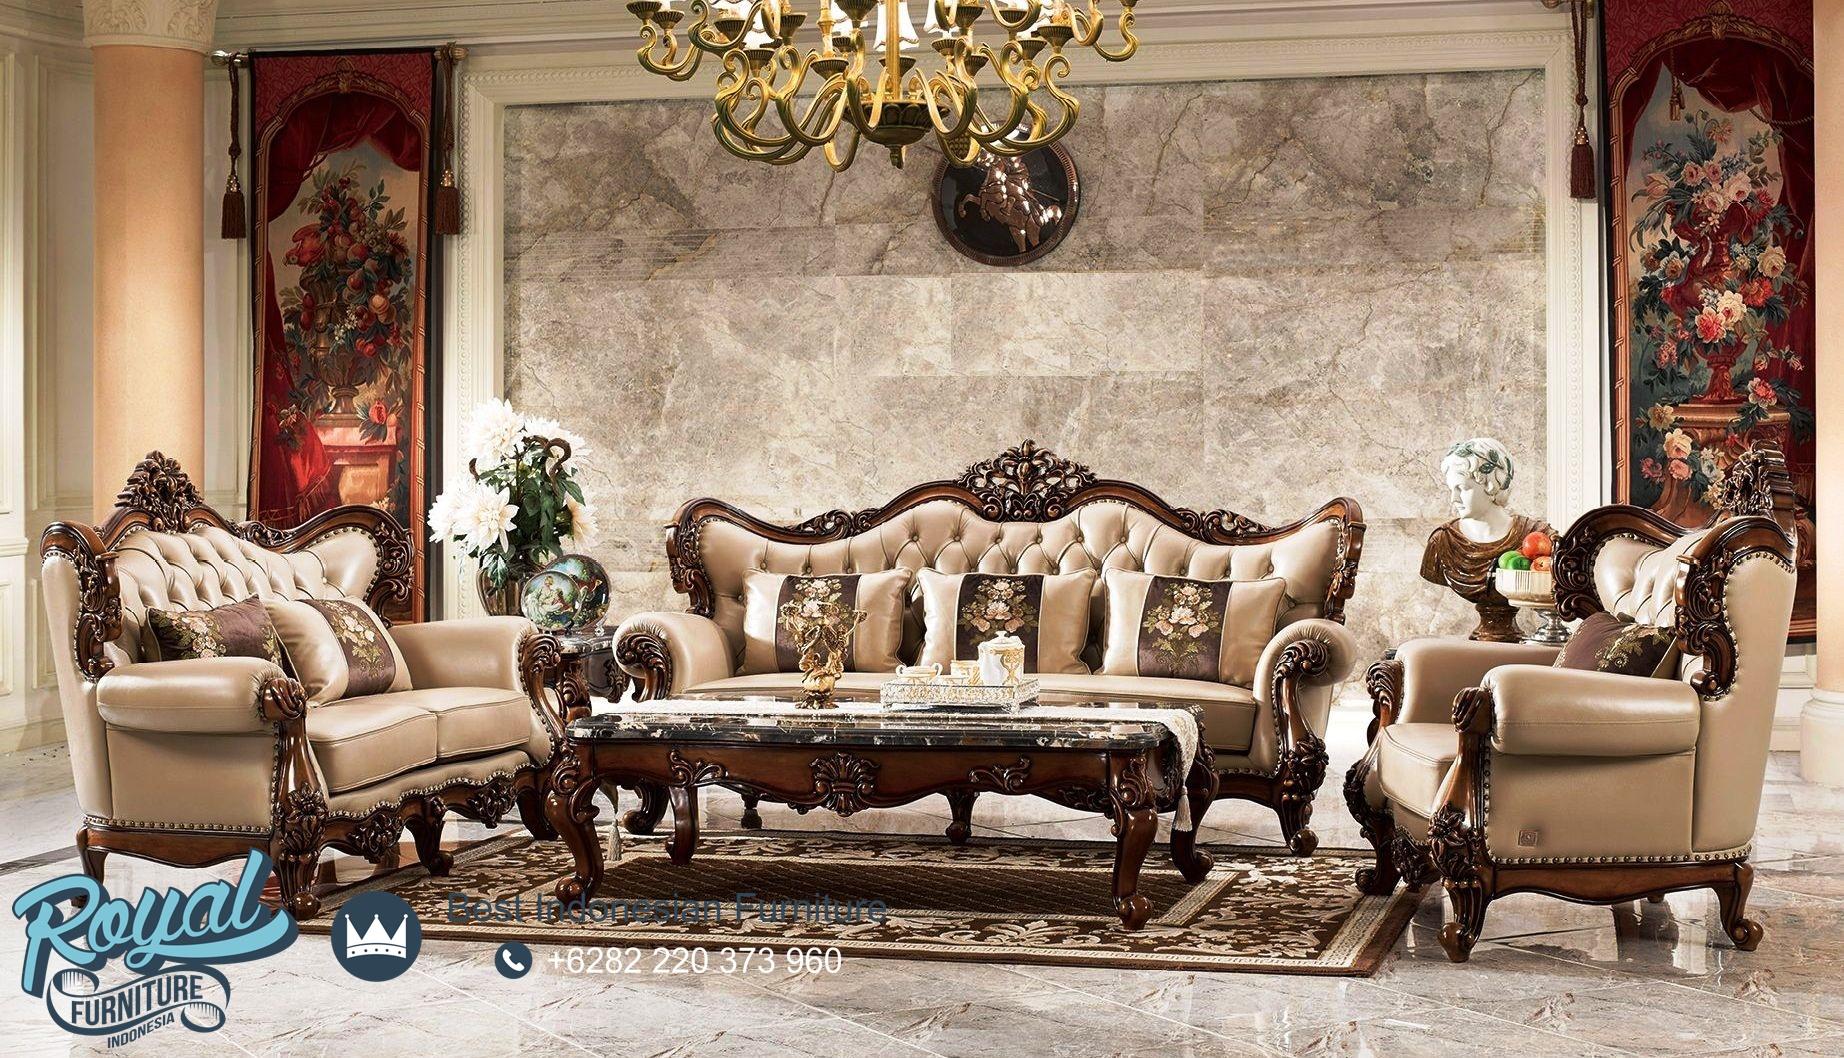 Kursi Sofa Tamu Mewah Kayu Jati Jepara Ukiran Klasik Murah, sofa tamu jepara terbaru, sofa tamu mewah, sofa tamu mewah klasik, sofa ruang tamu mewah modern, sofa mewah modern, sofa mewah minimalis, kursi tamu mewah kualitas terbaik, sofa tamu mewah terbaru, sofa mewah minimalis terbaru, harga kursi tamu mewah, kursi tamu sofa, harga sofa jepara terbaru, toko furniture jepara, kursi sofa tamu kayu jati ukiran jepara, jual kursi sofa tamu ukir jepara, sofa tamu kayu jati jepara murah, mebel jepara, royal furniture